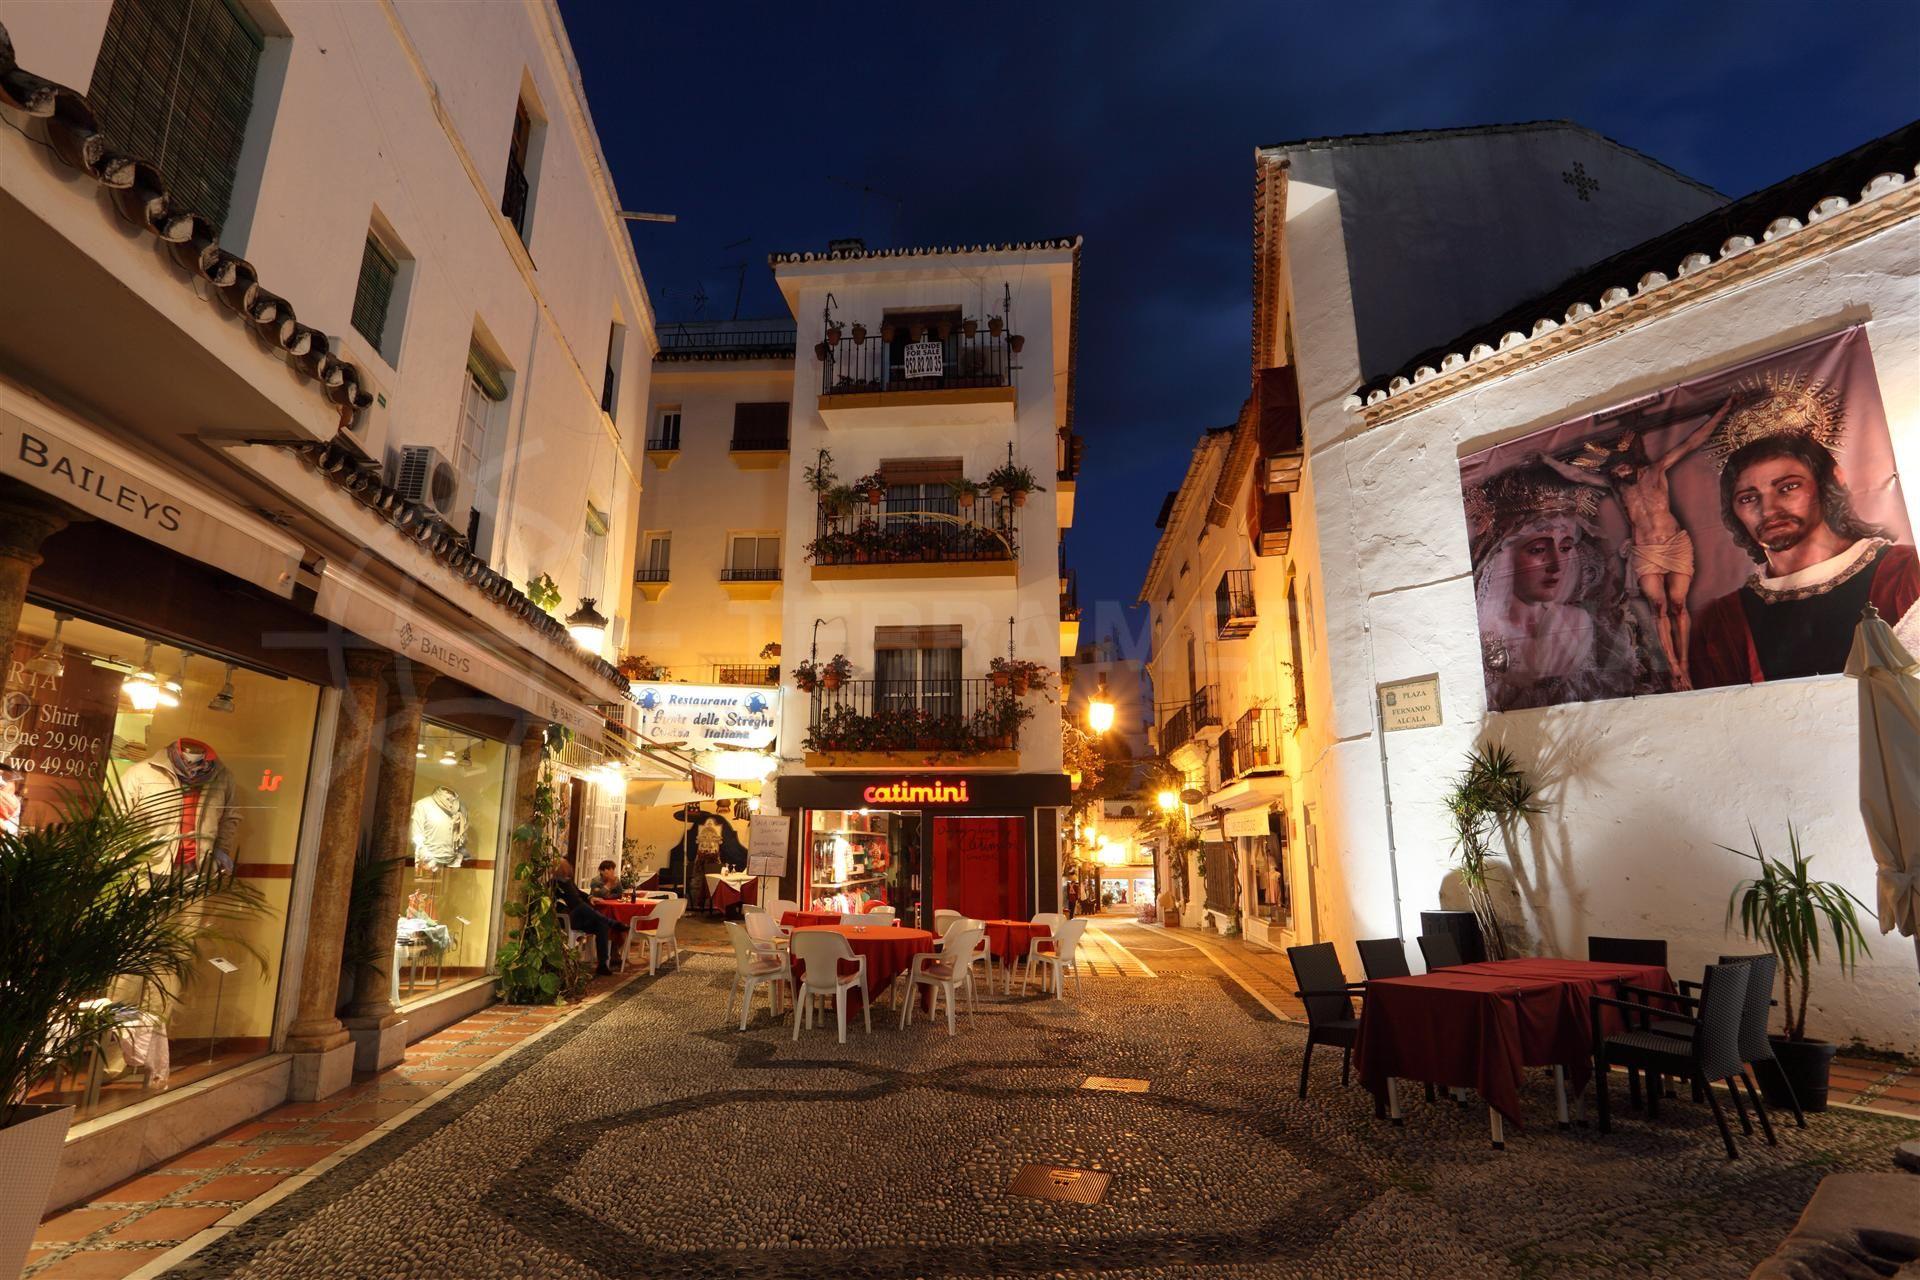 Culture in Marbella